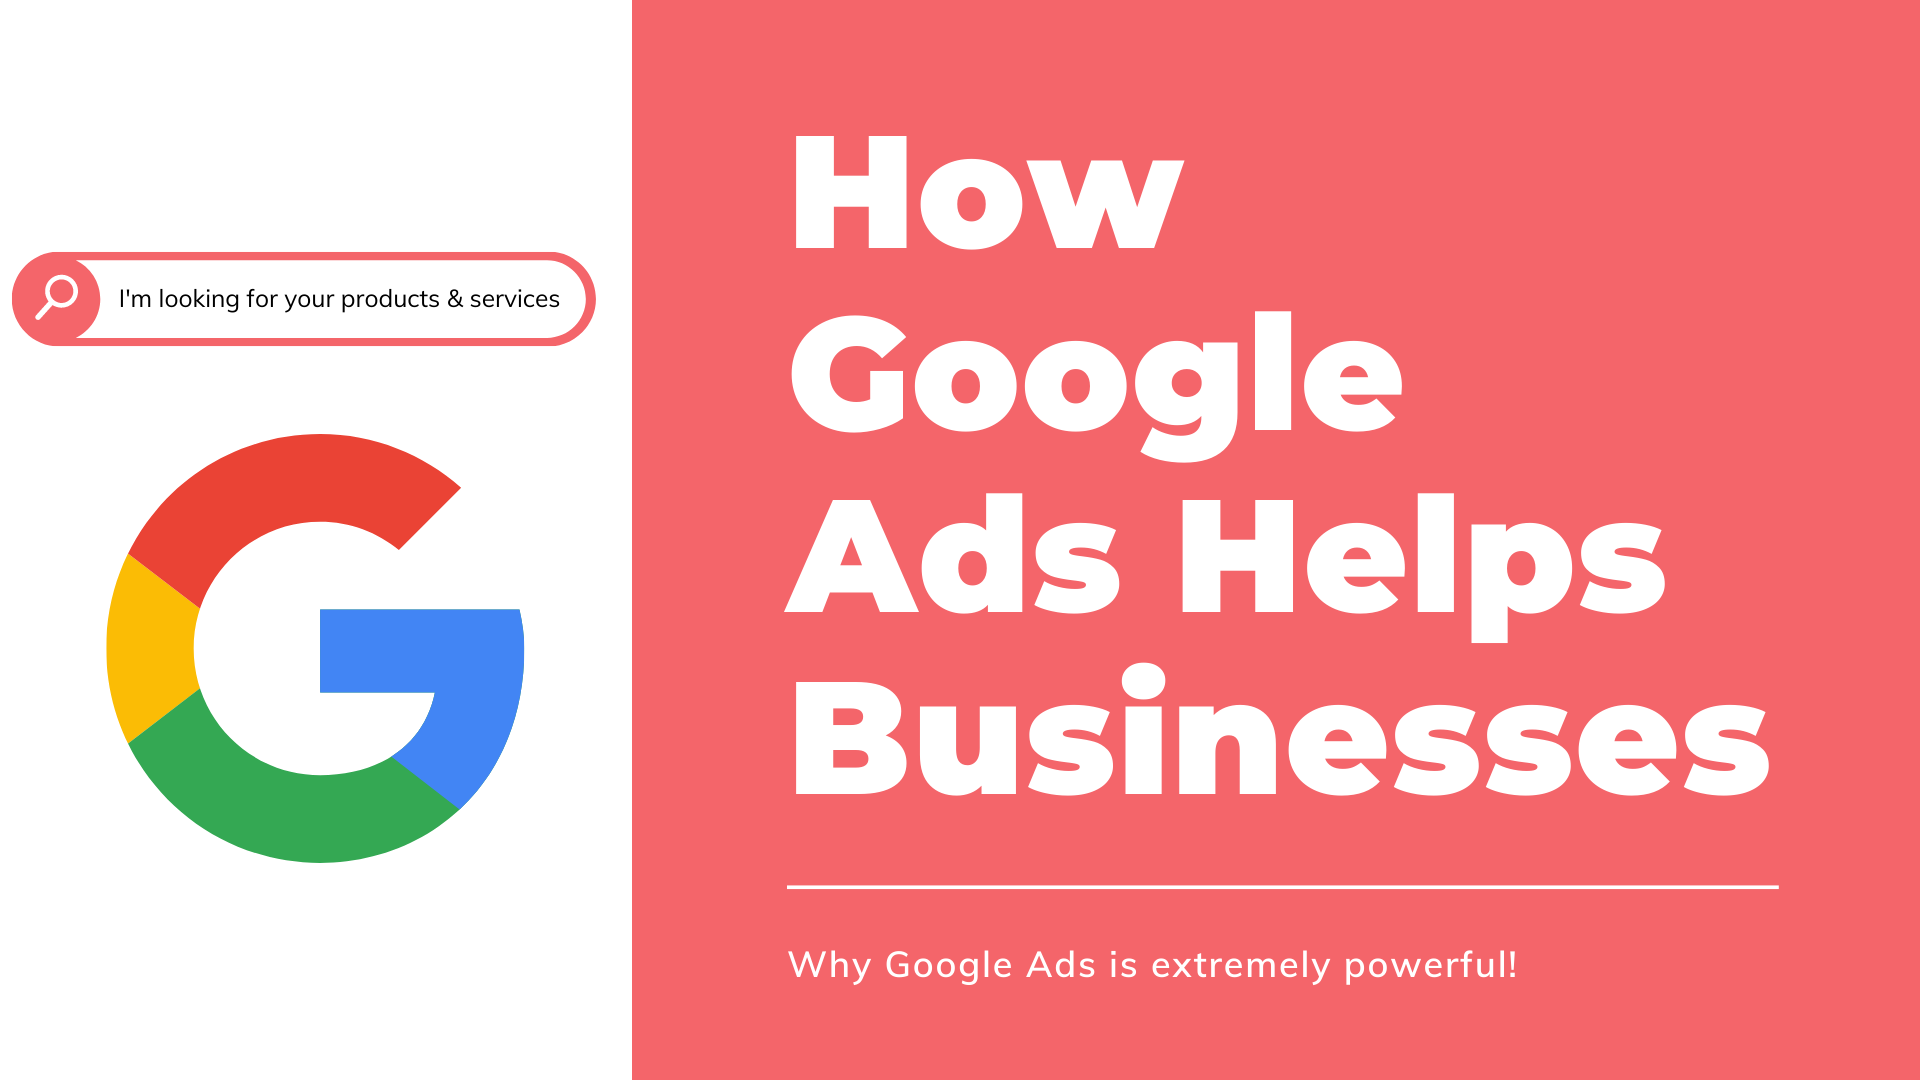 How Google Ads Benefits